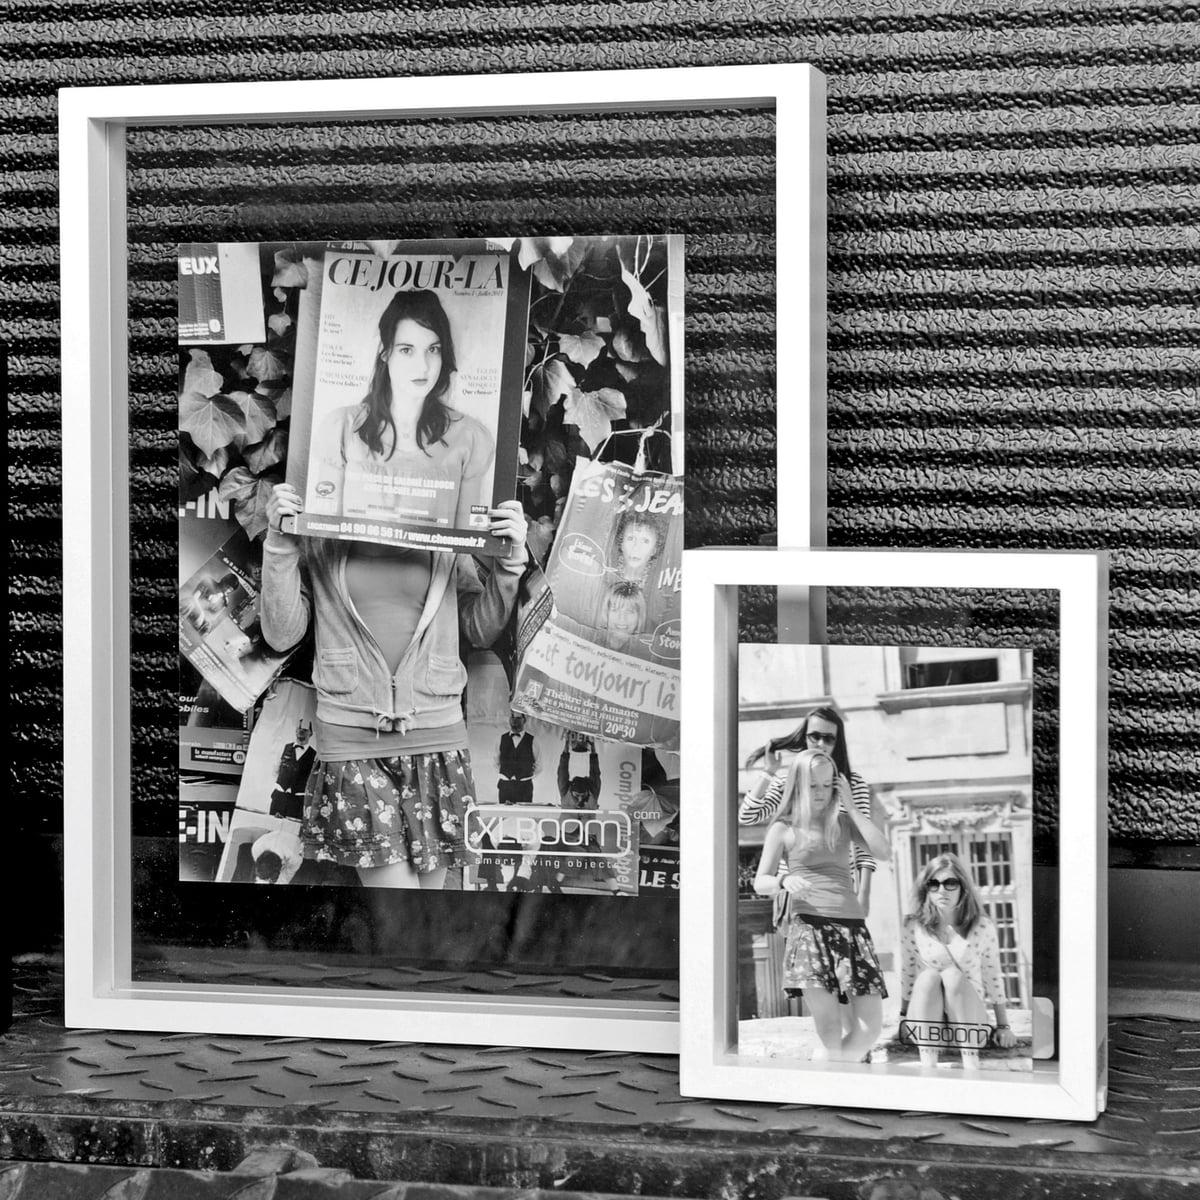 Groß Uk Bilderrahmen Größen Fotos - Benutzerdefinierte Bilderrahmen ...